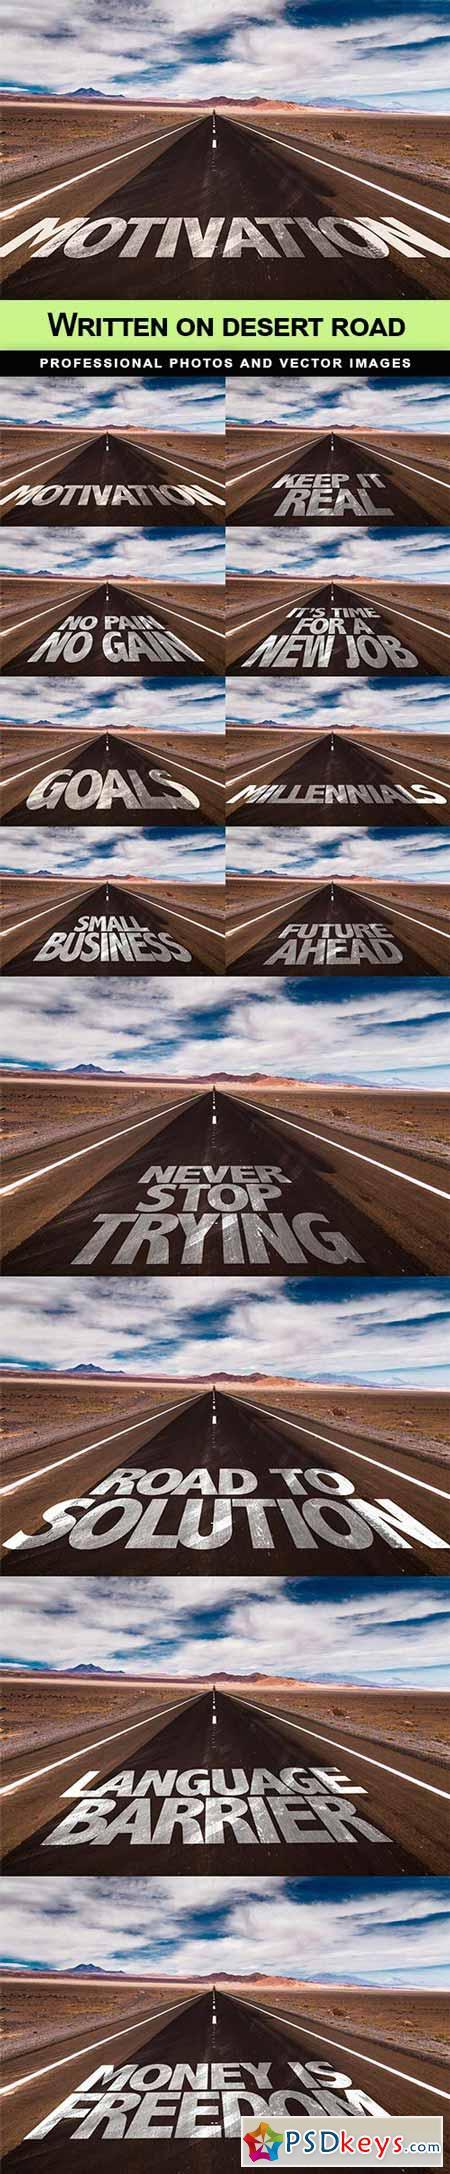 Written on desert road - 12 UHQ JPEG